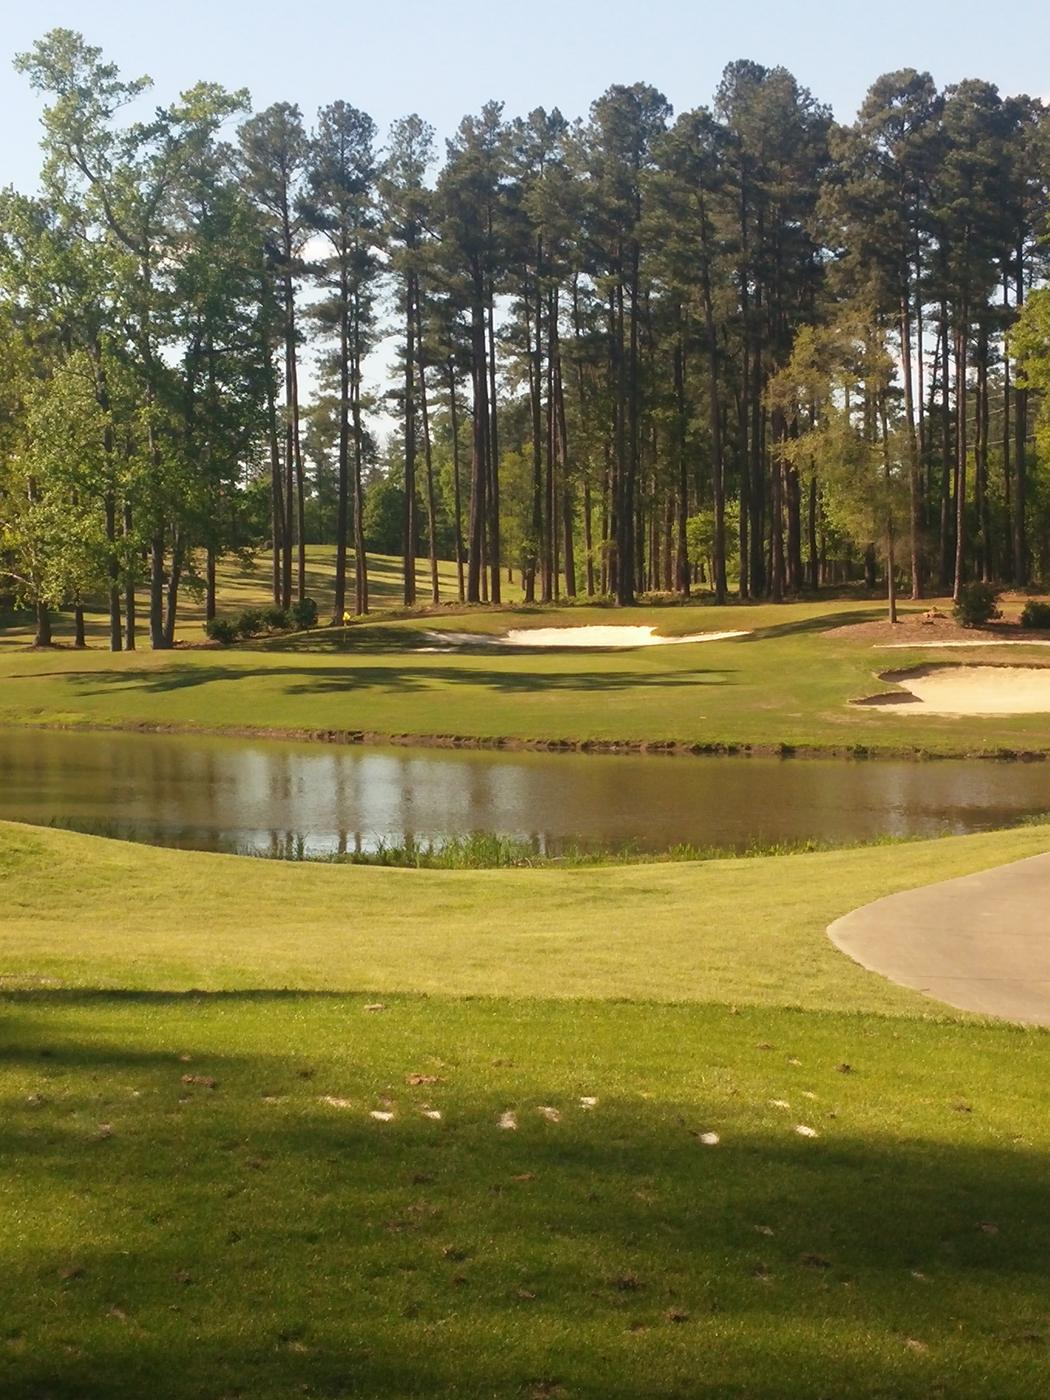 Golf Course Clubhouse Interior Design Ideas: Highland Creek Golf Club In Charlotte, North Carolina, USA